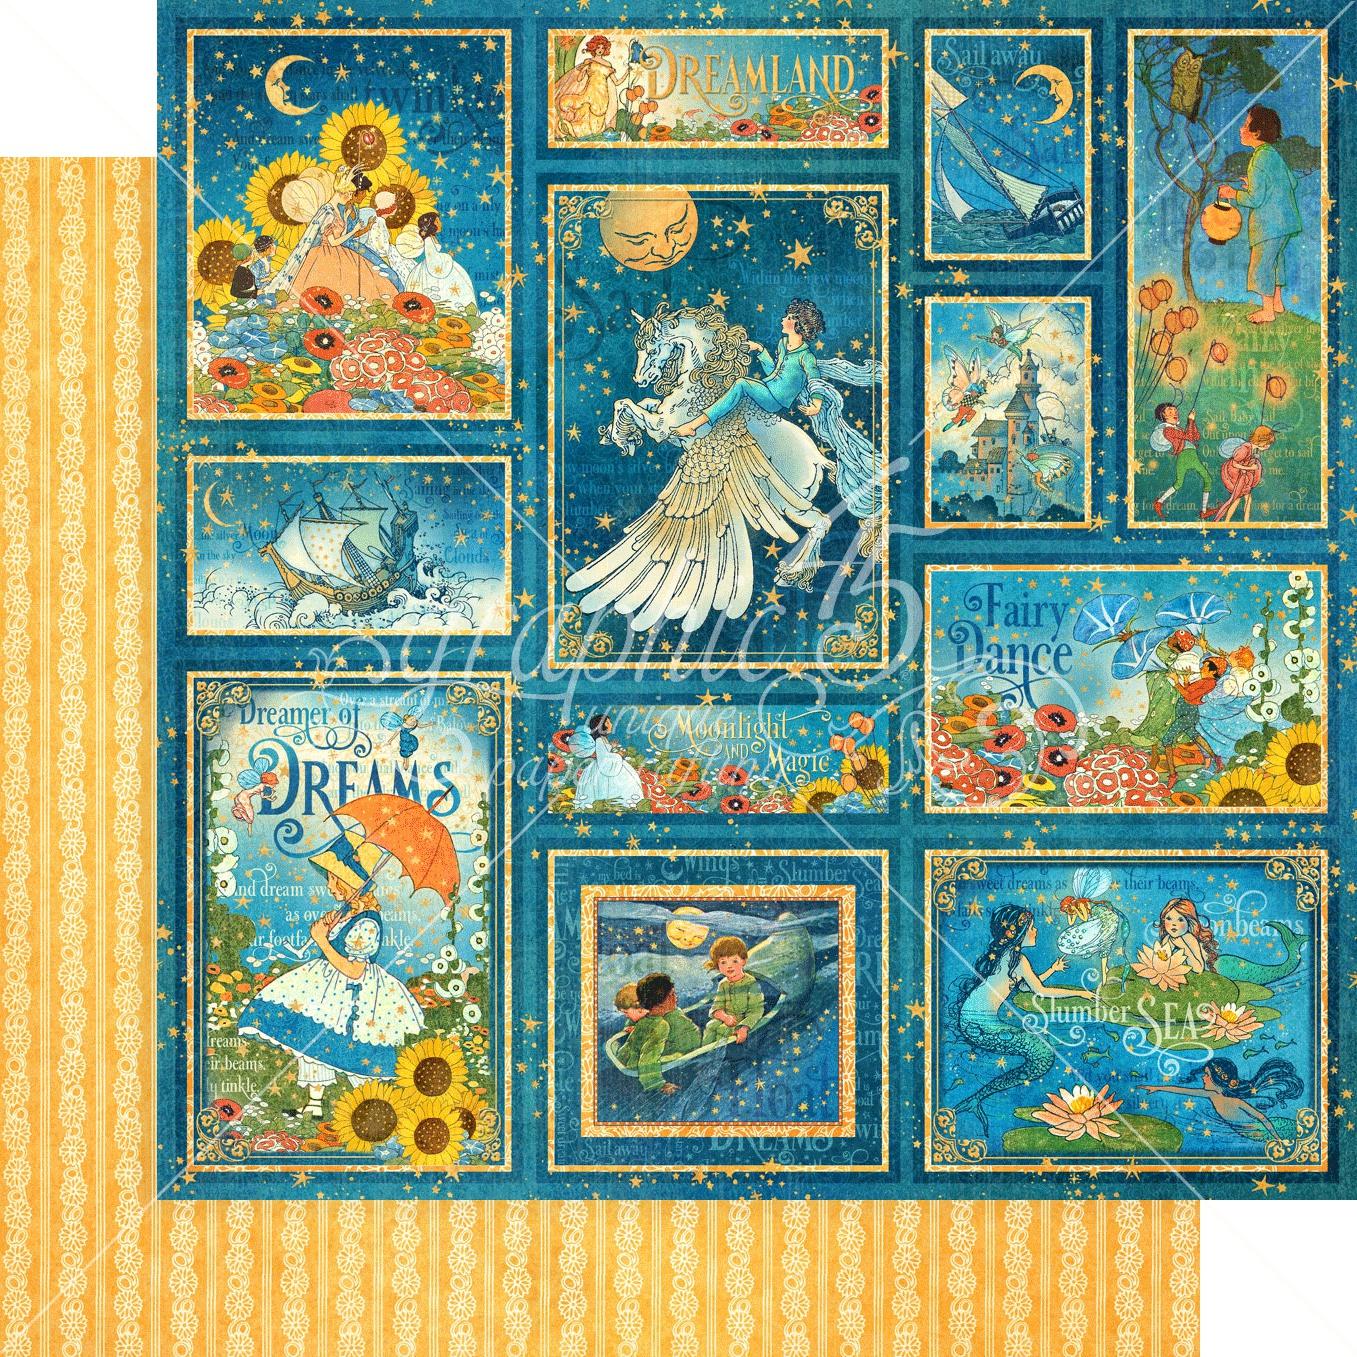 Dreamland-Stars Aligned 12x12 paper